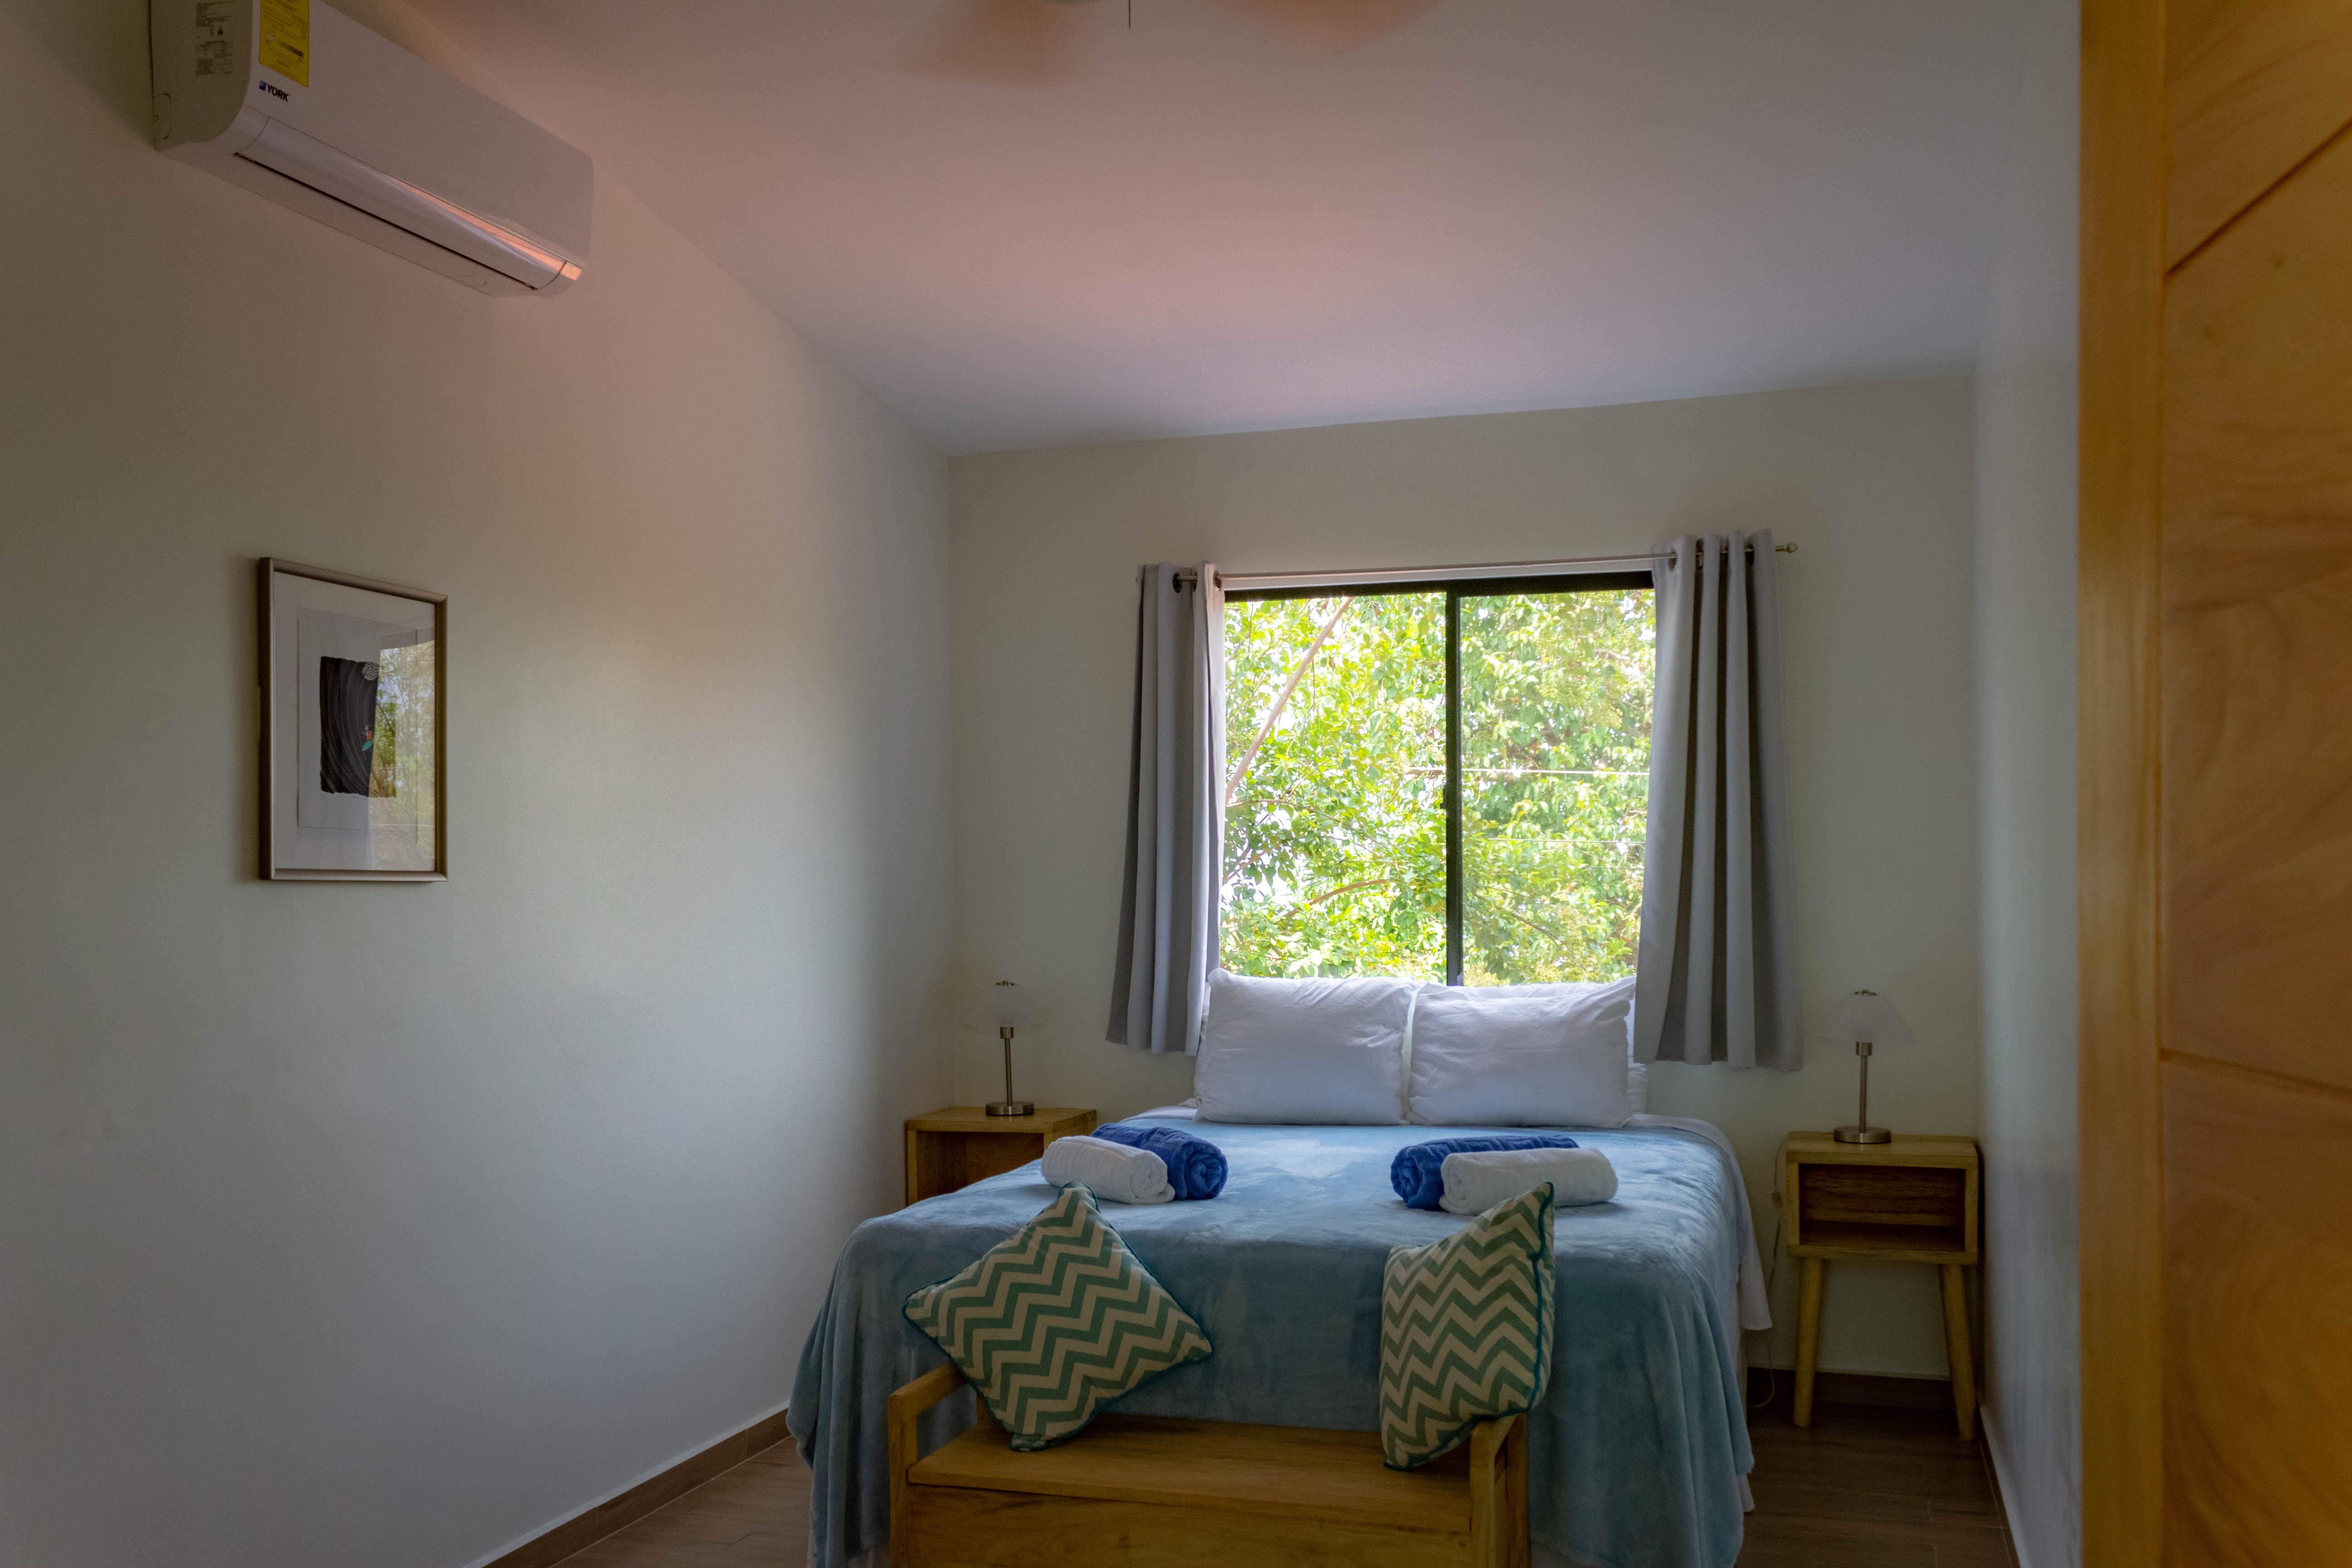 View of the second casita bedroom